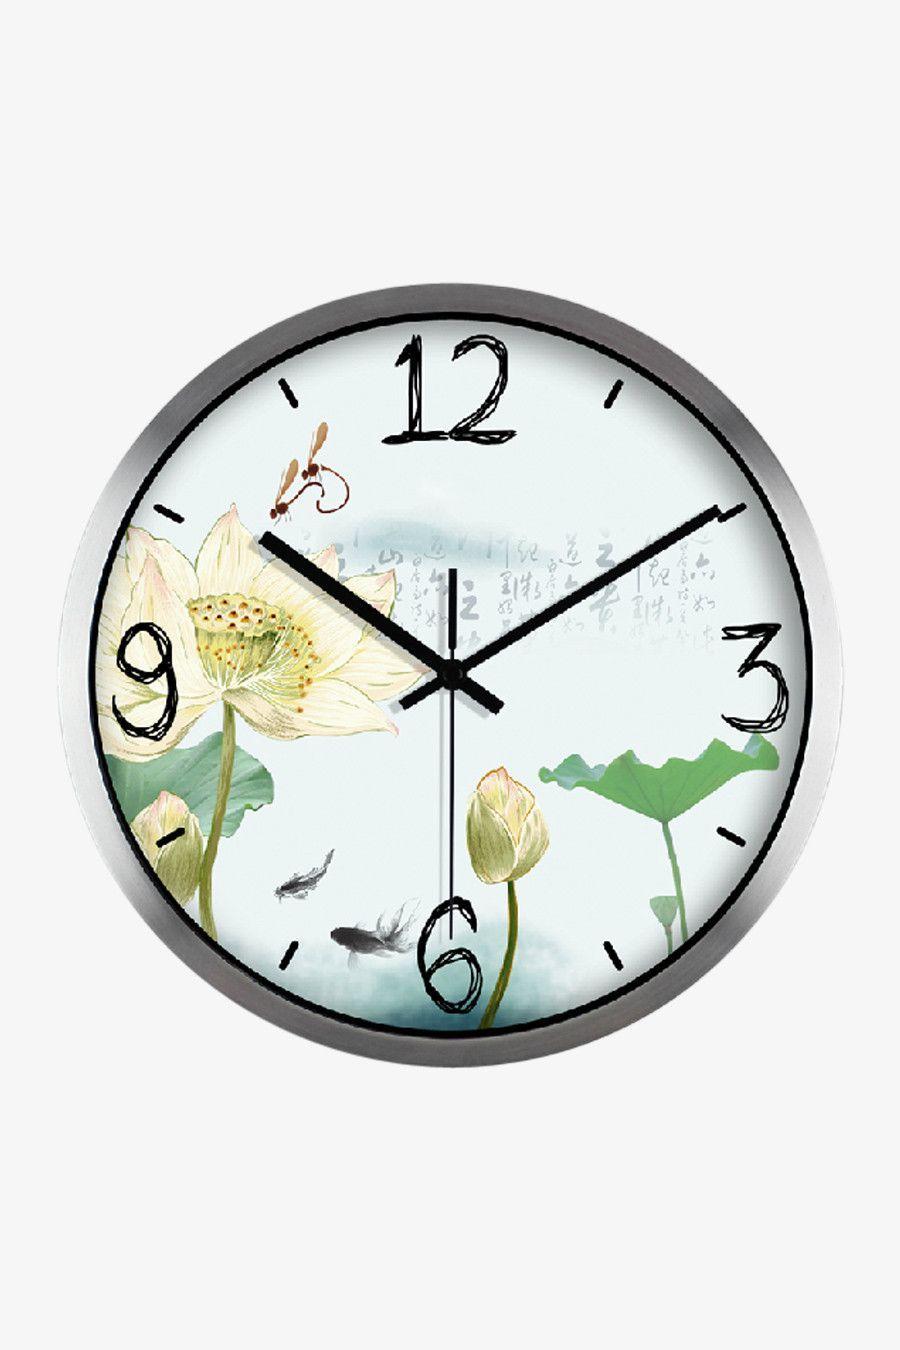 Lotus Print Clock Silver Satin Wall Clock Painting Floral Clock